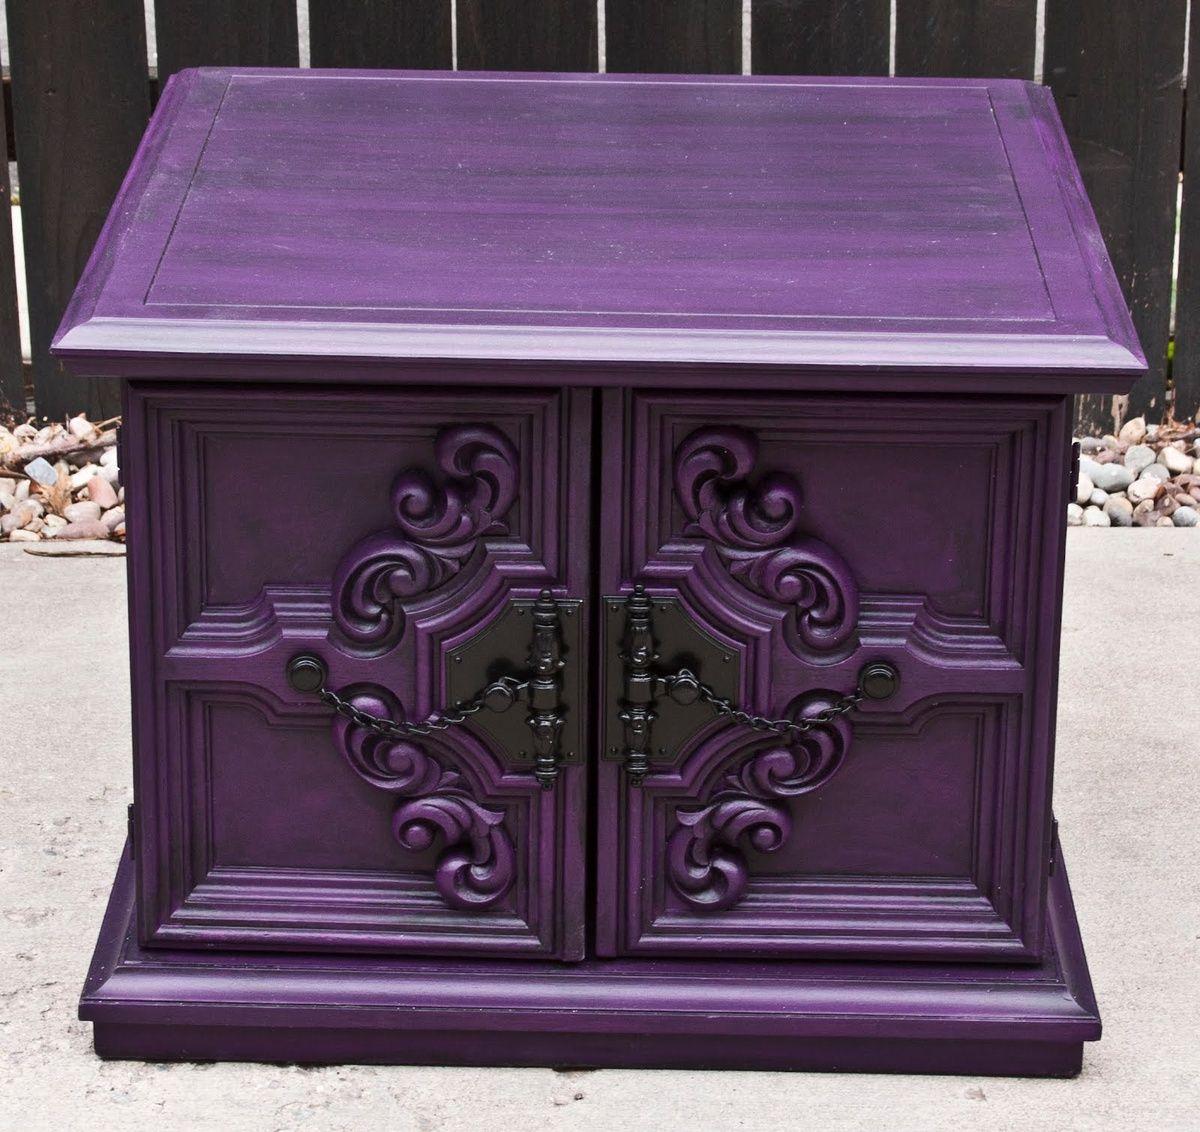 best 25 purple spray paint ideas on pinterest crafts with wine bottles decorative glass. Black Bedroom Furniture Sets. Home Design Ideas